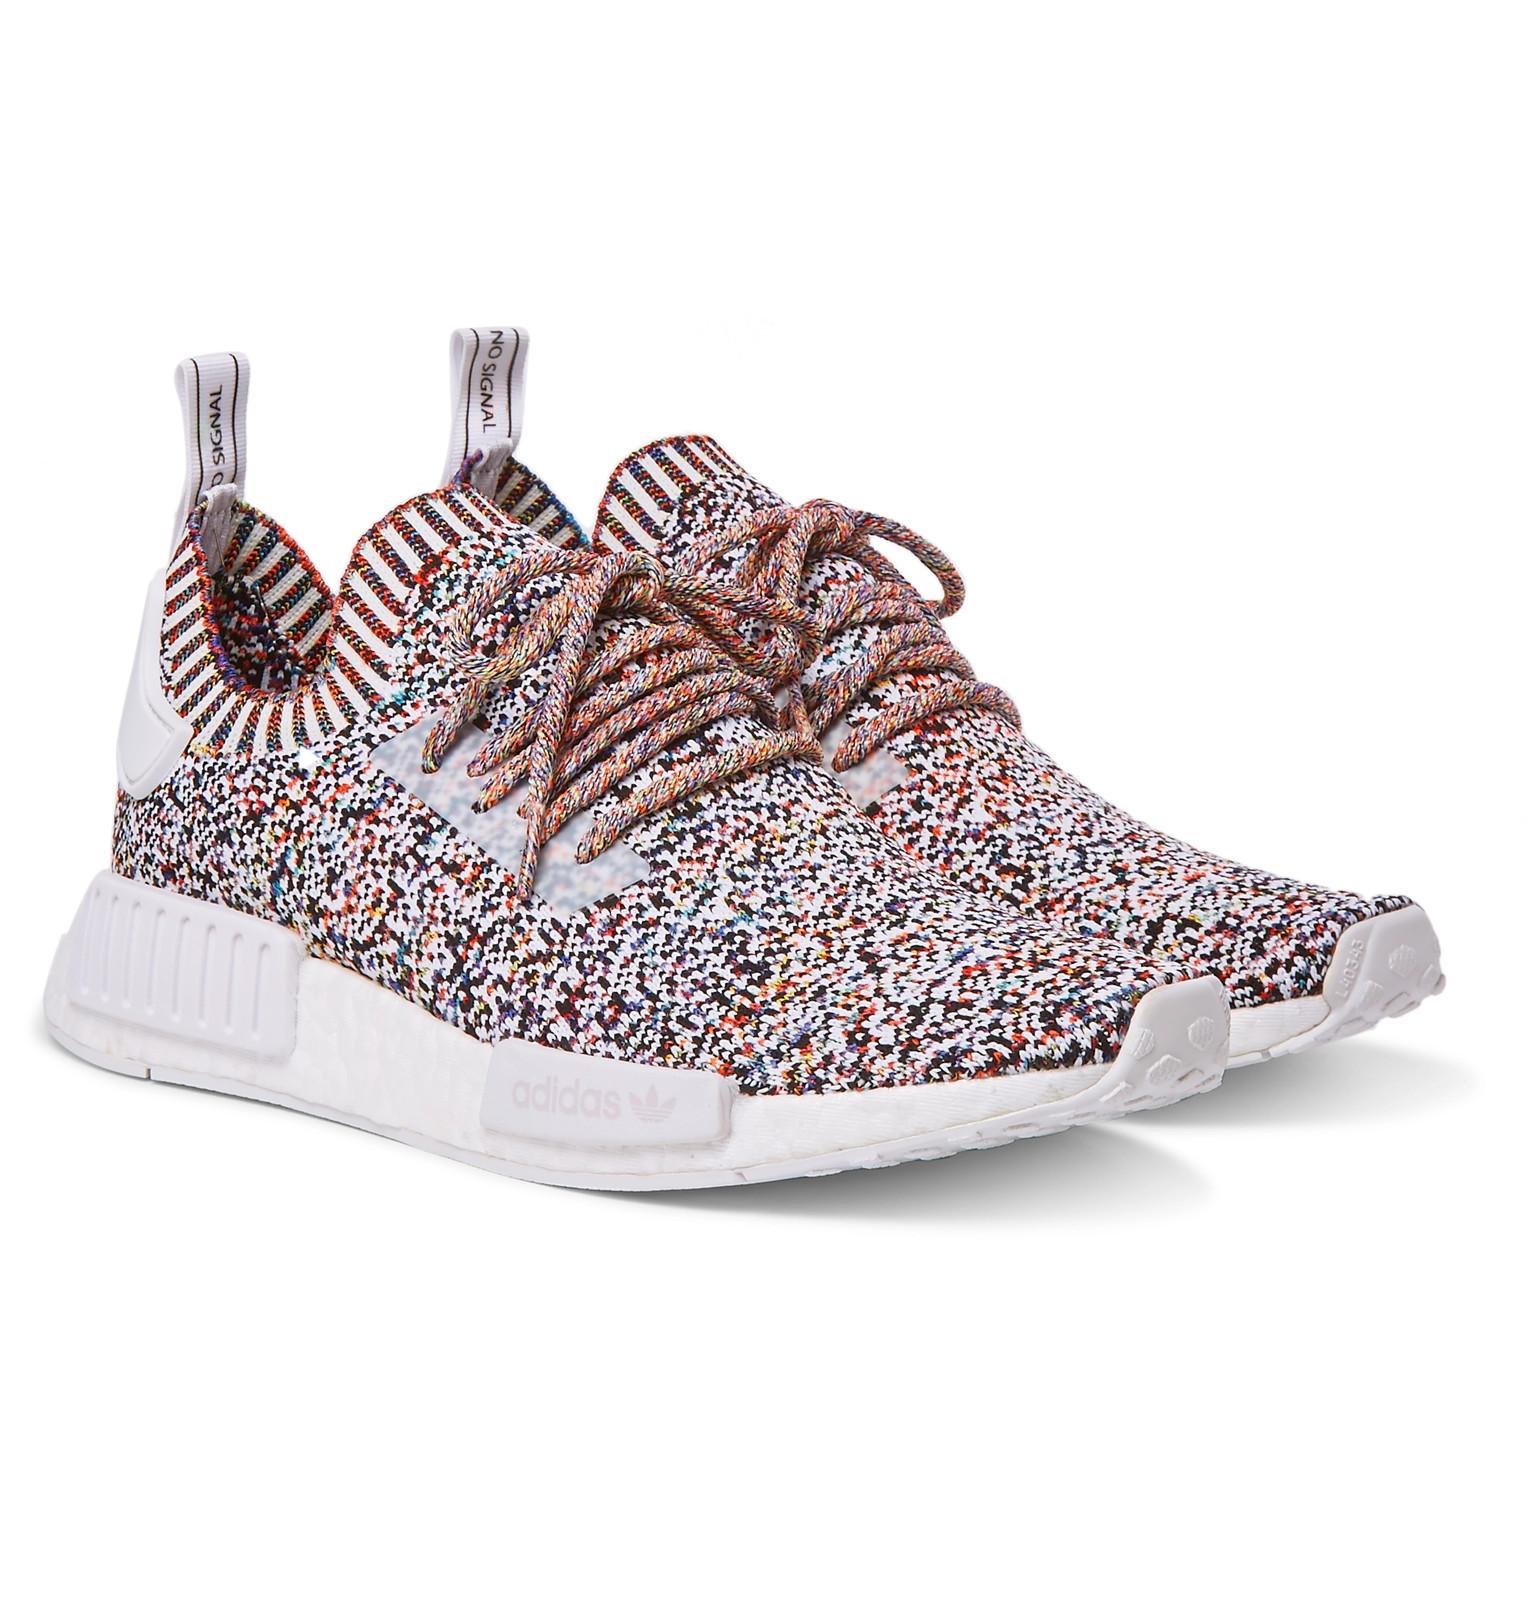 sale retailer 345f3 cc527 Lyst - adidas Originals Nmd R1 Primeknit Sneakers for Men